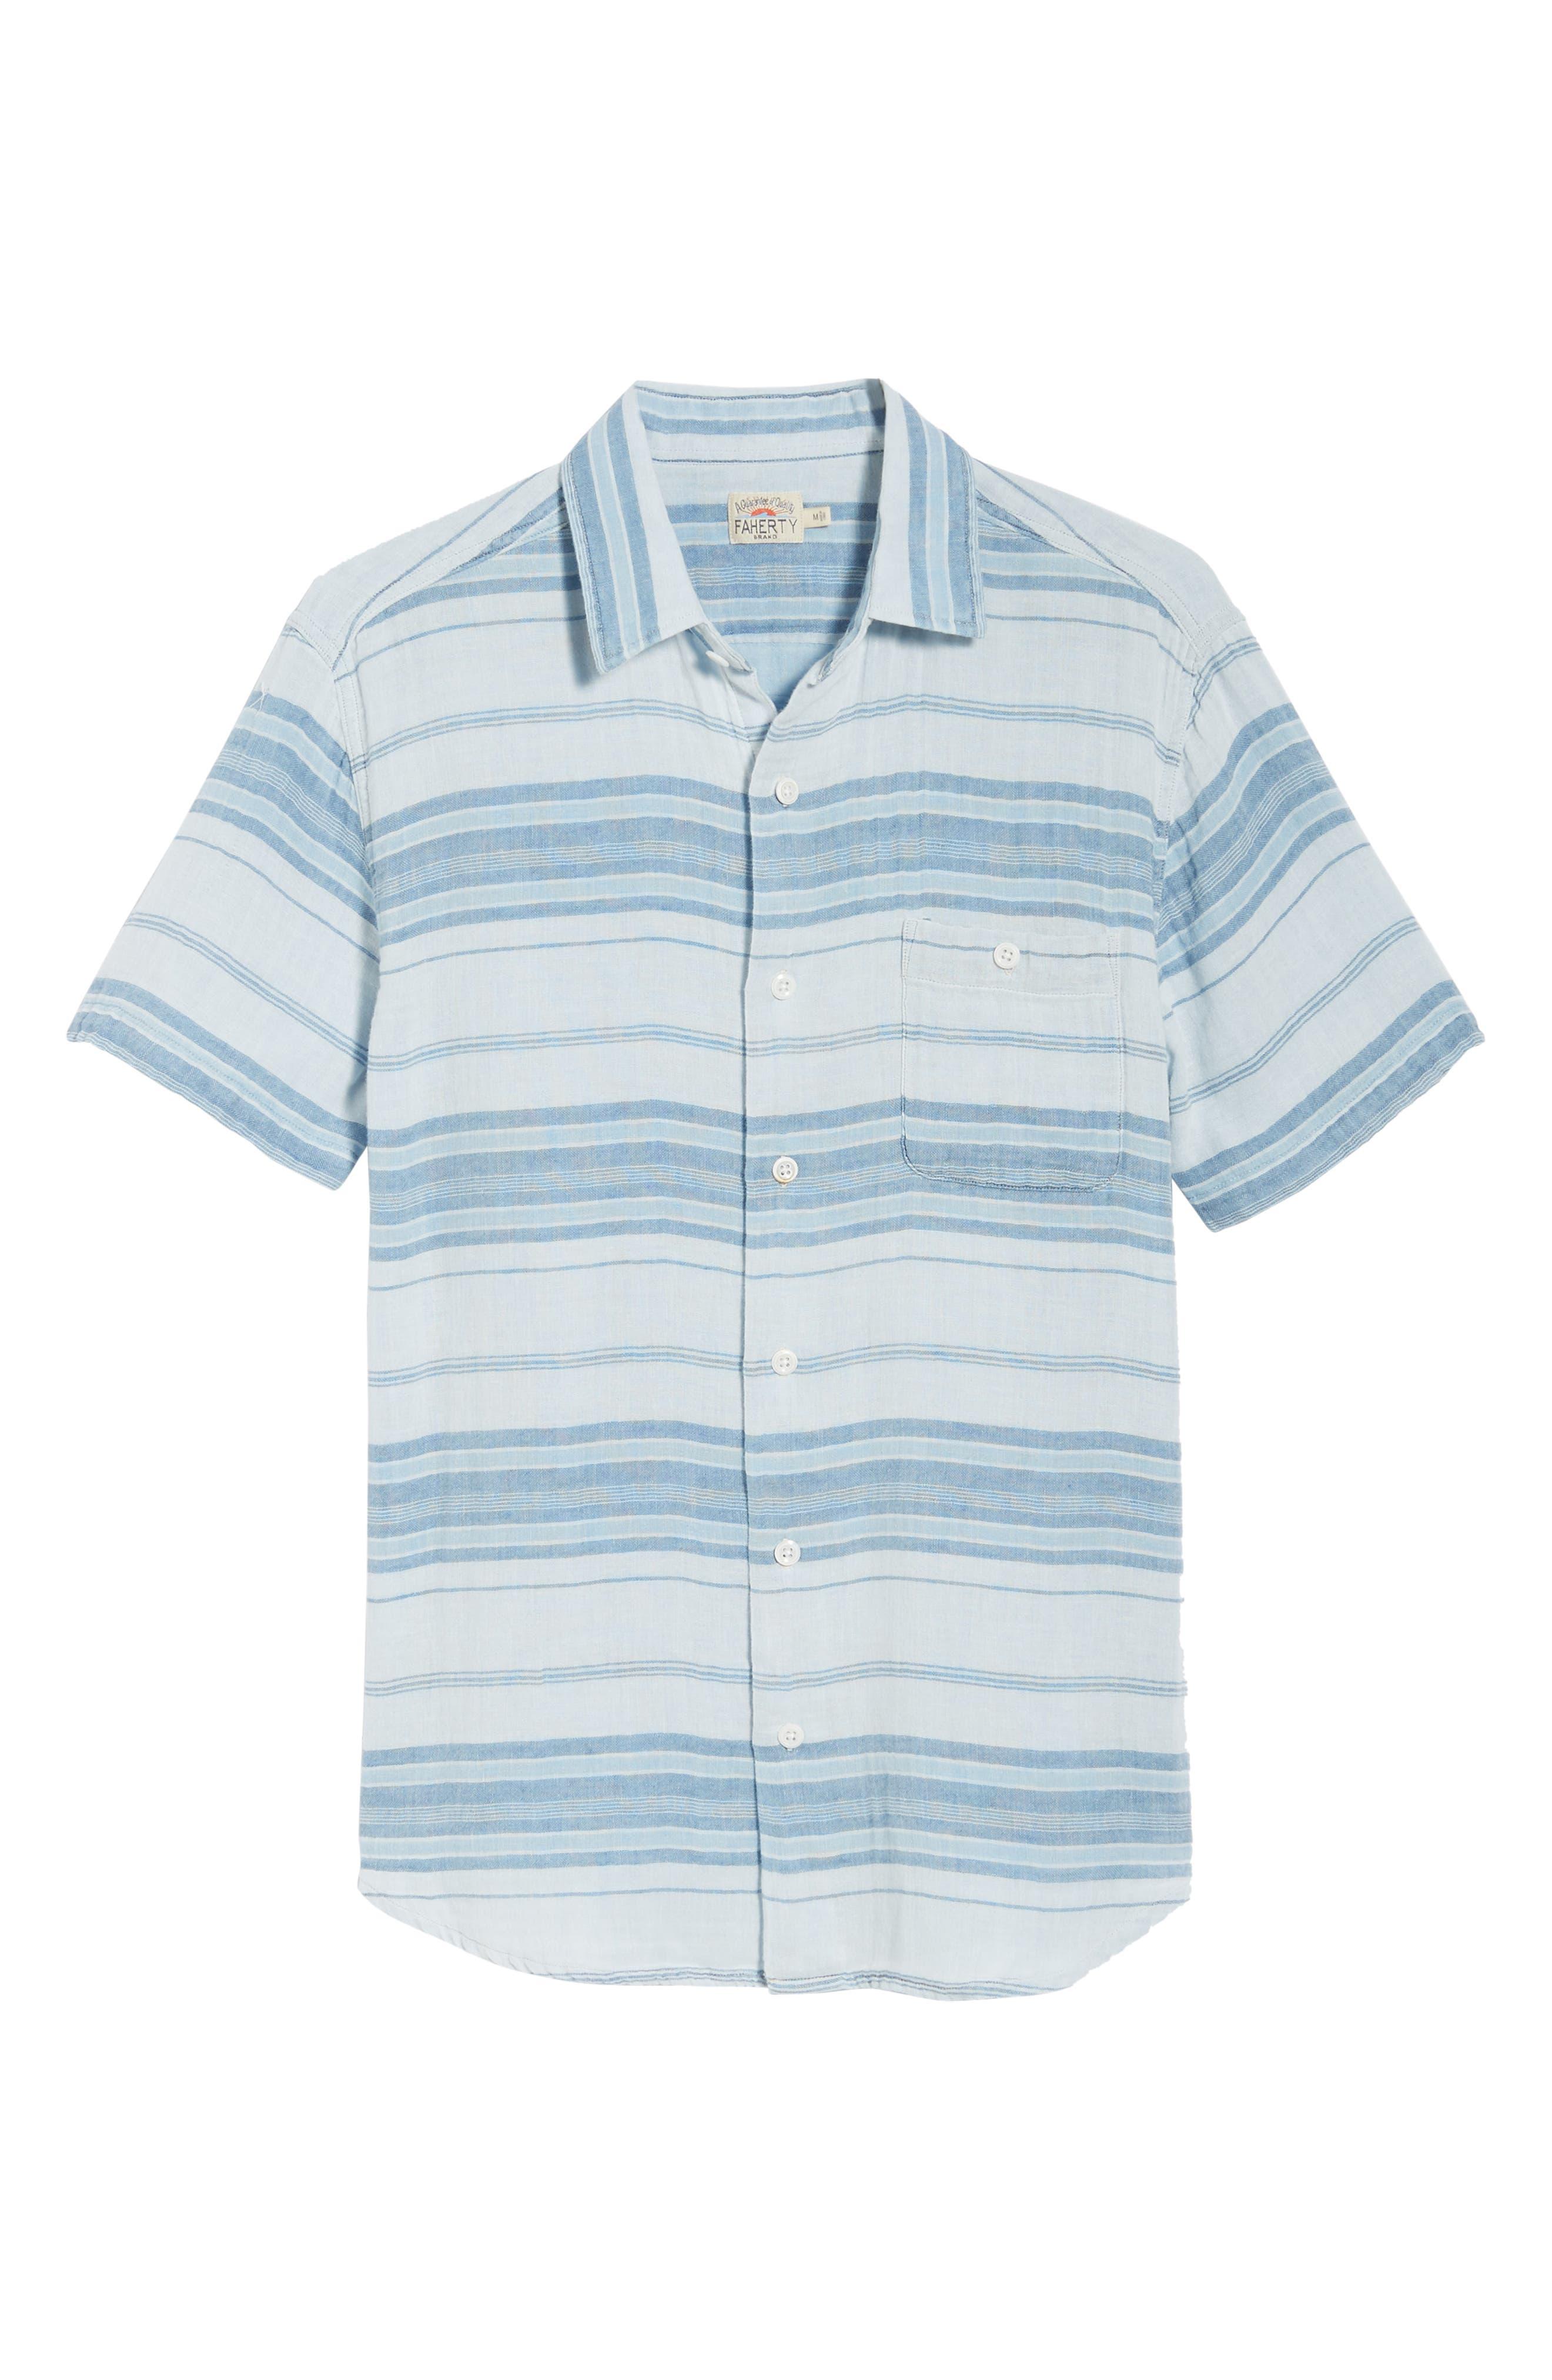 Ventura Double Cloth Short Sleeve Shirt,                             Alternate thumbnail 6, color,                             Light Indigo Serape